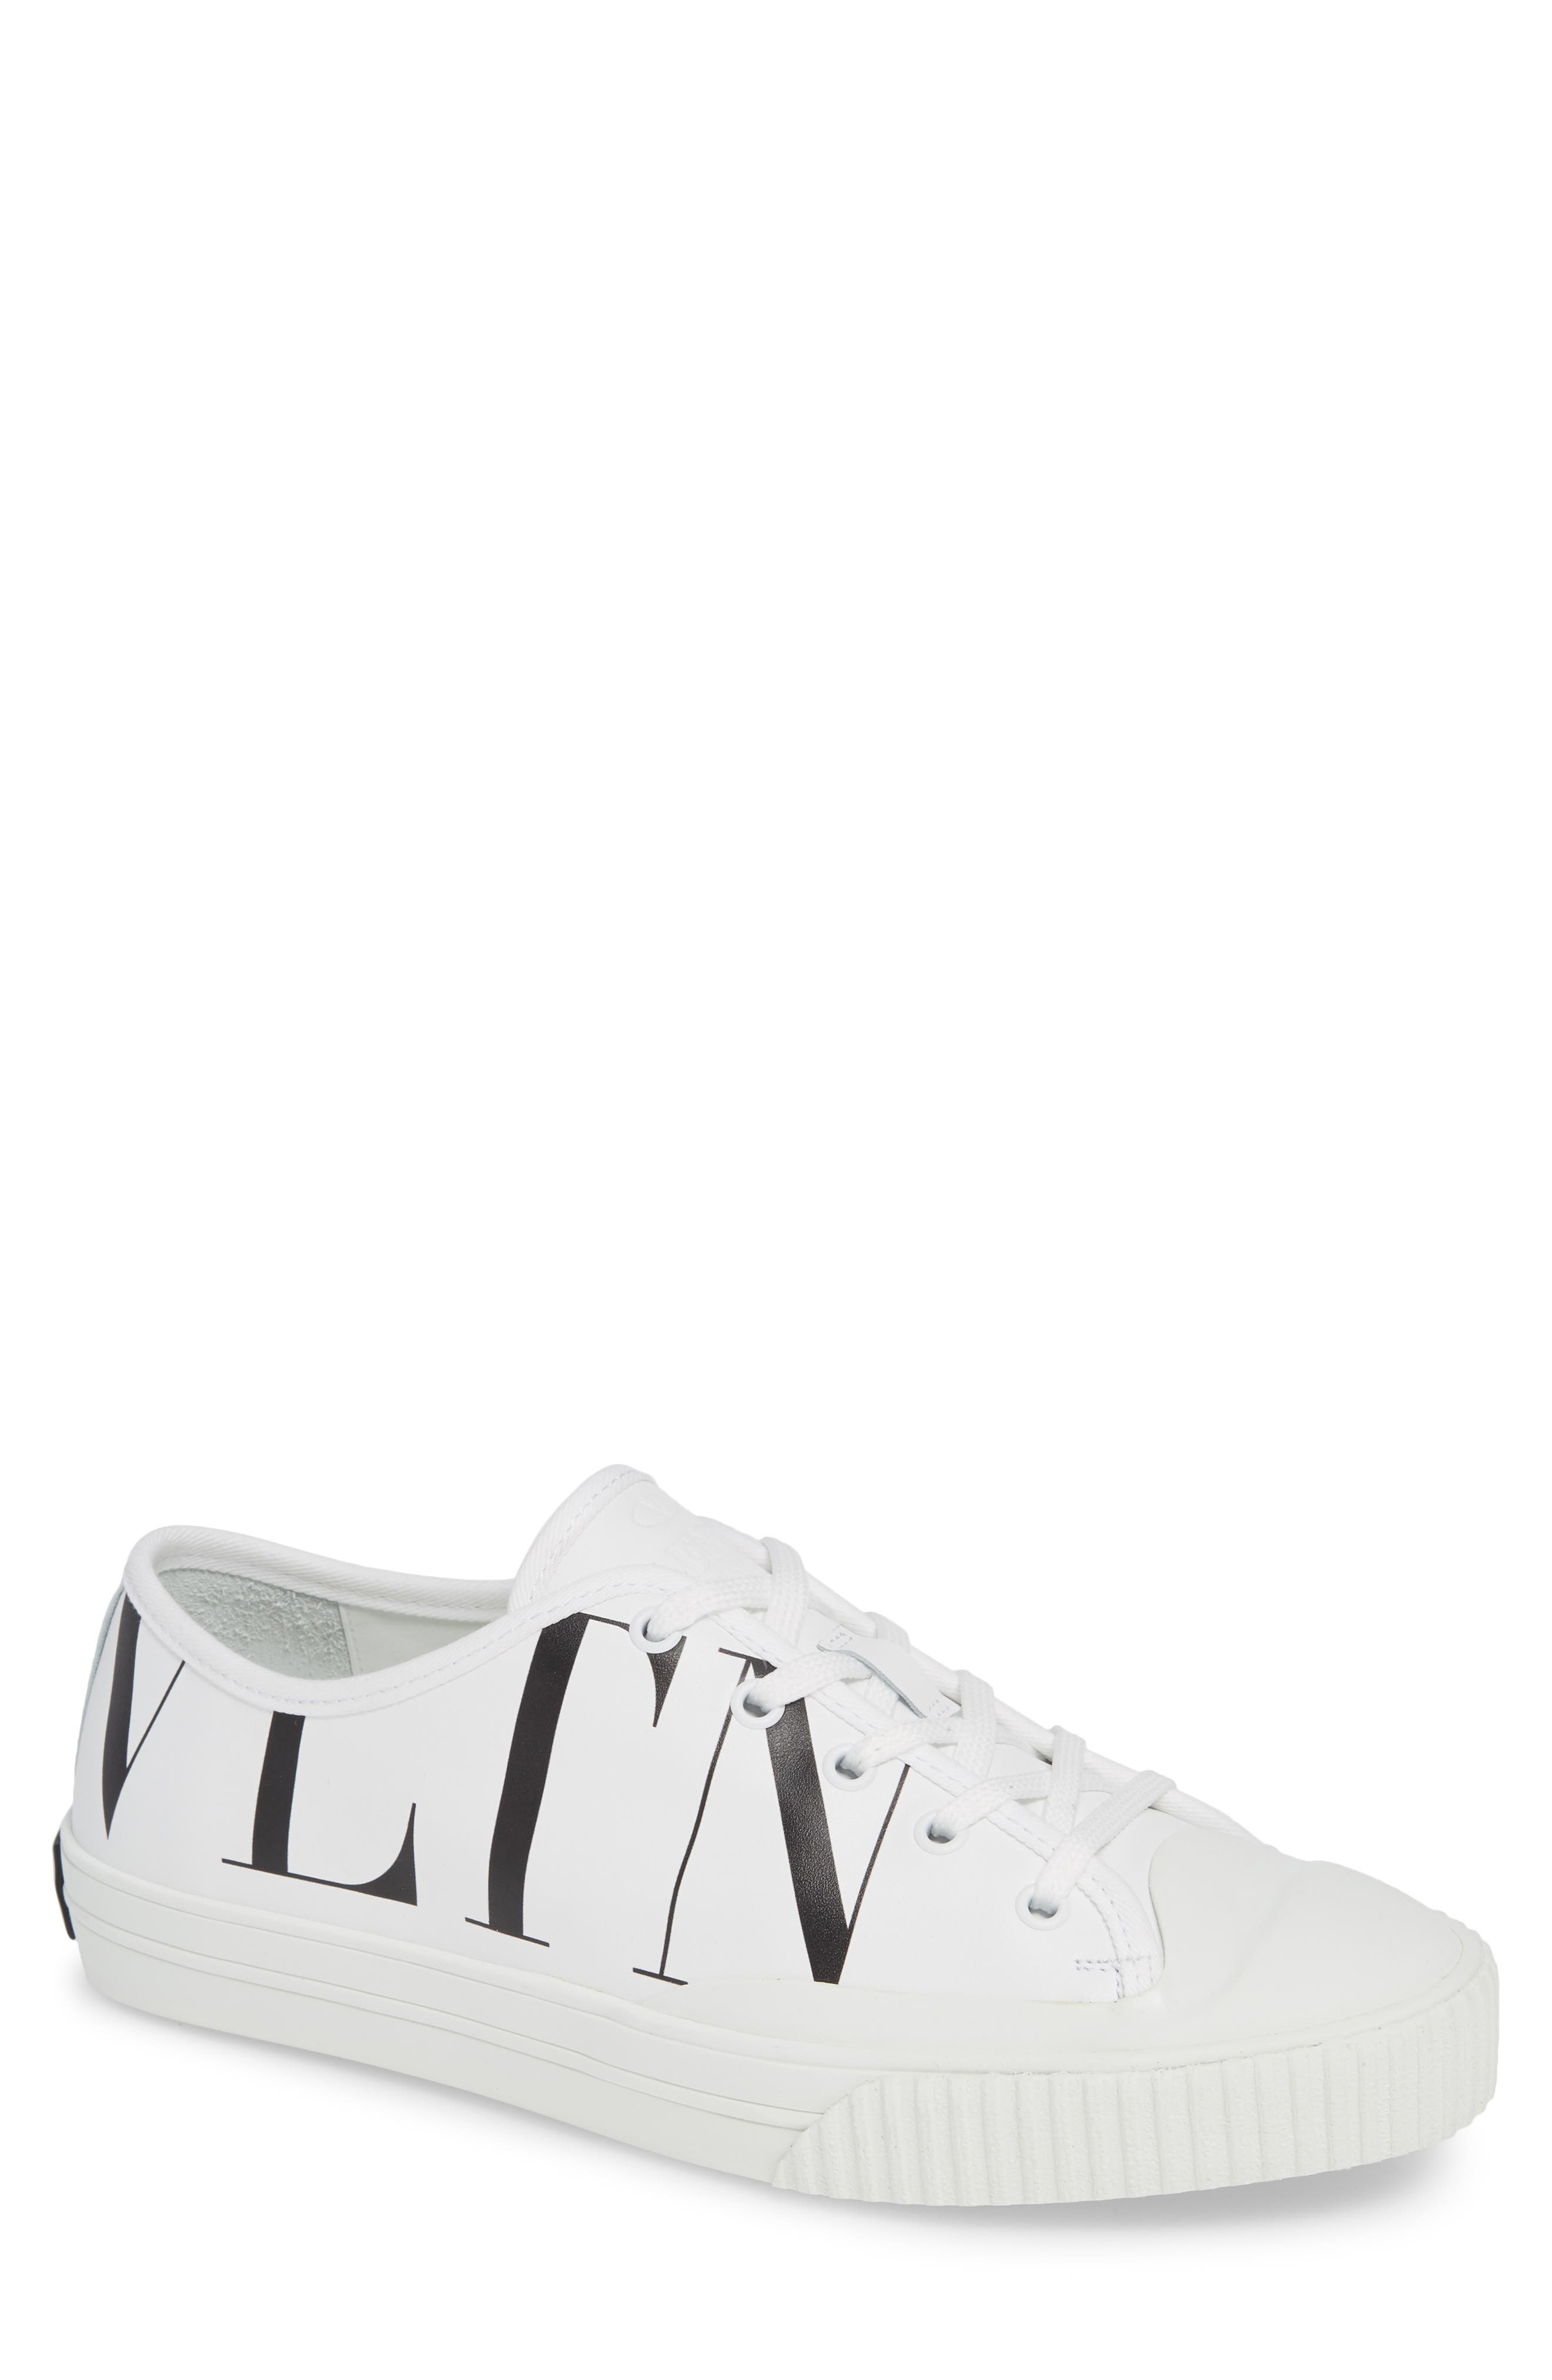 VLTN Low Top Sneaker,                         Main,                         color, 102